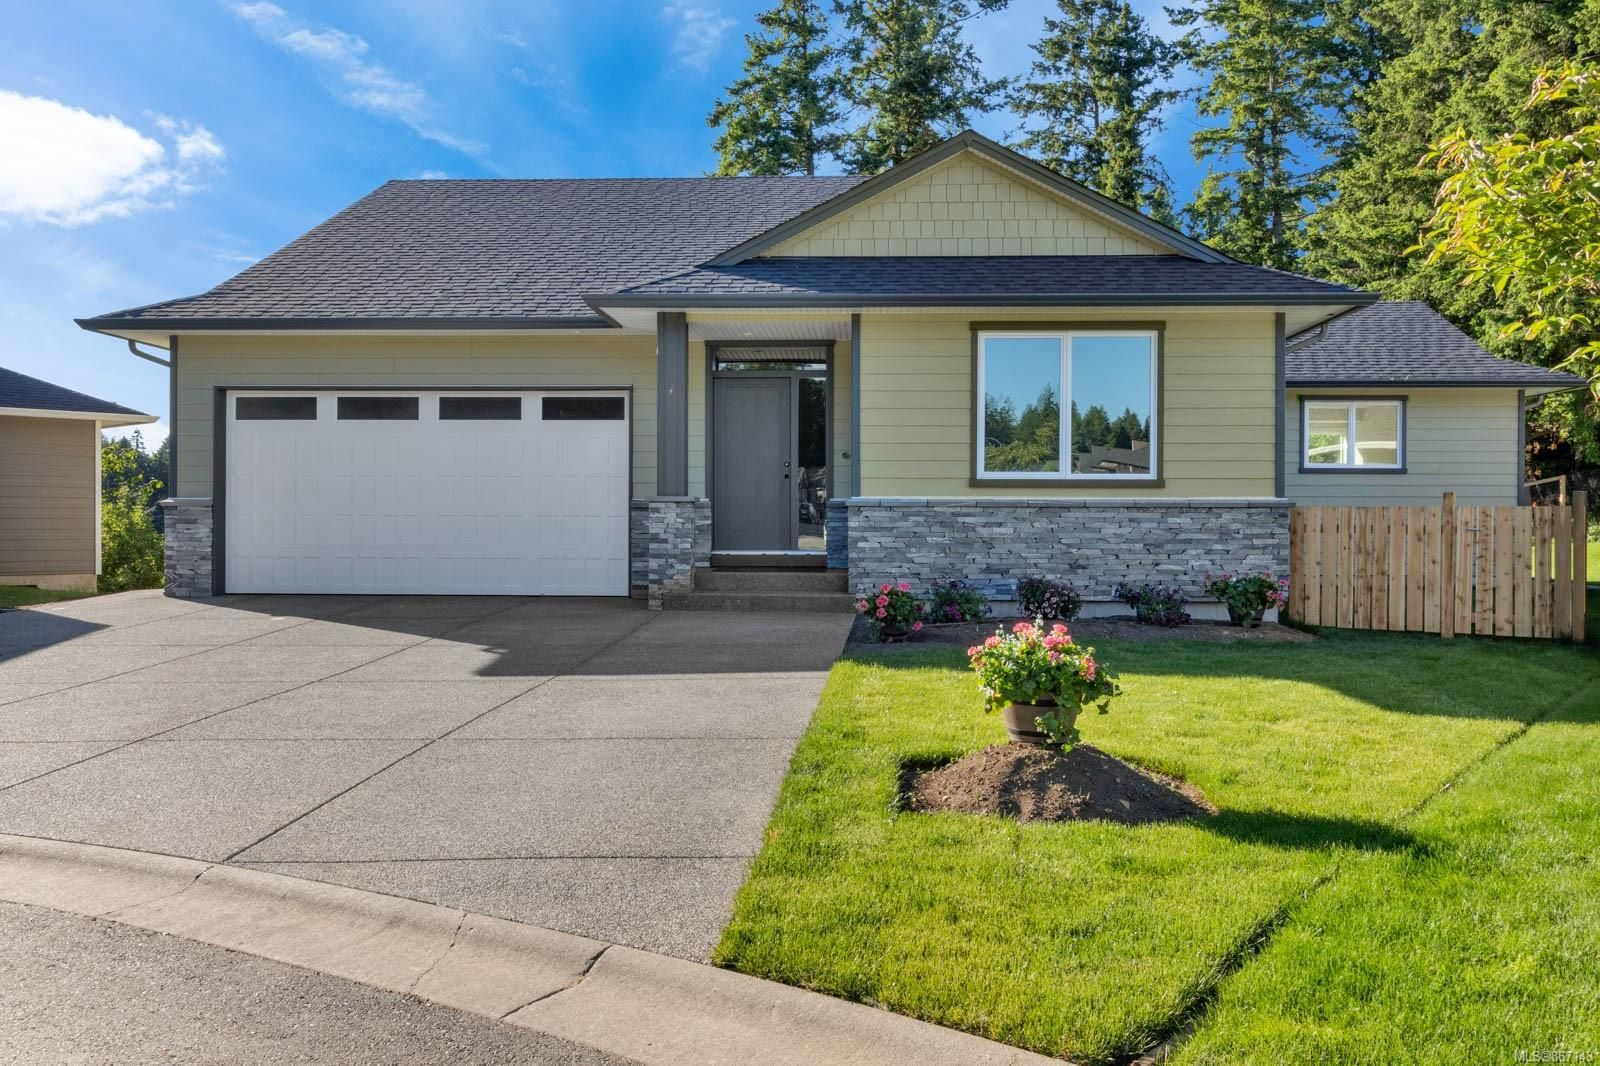 Main Photo: 2468 Dakota Pl in : CV Comox (Town of) House for sale (Comox Valley)  : MLS®# 867143